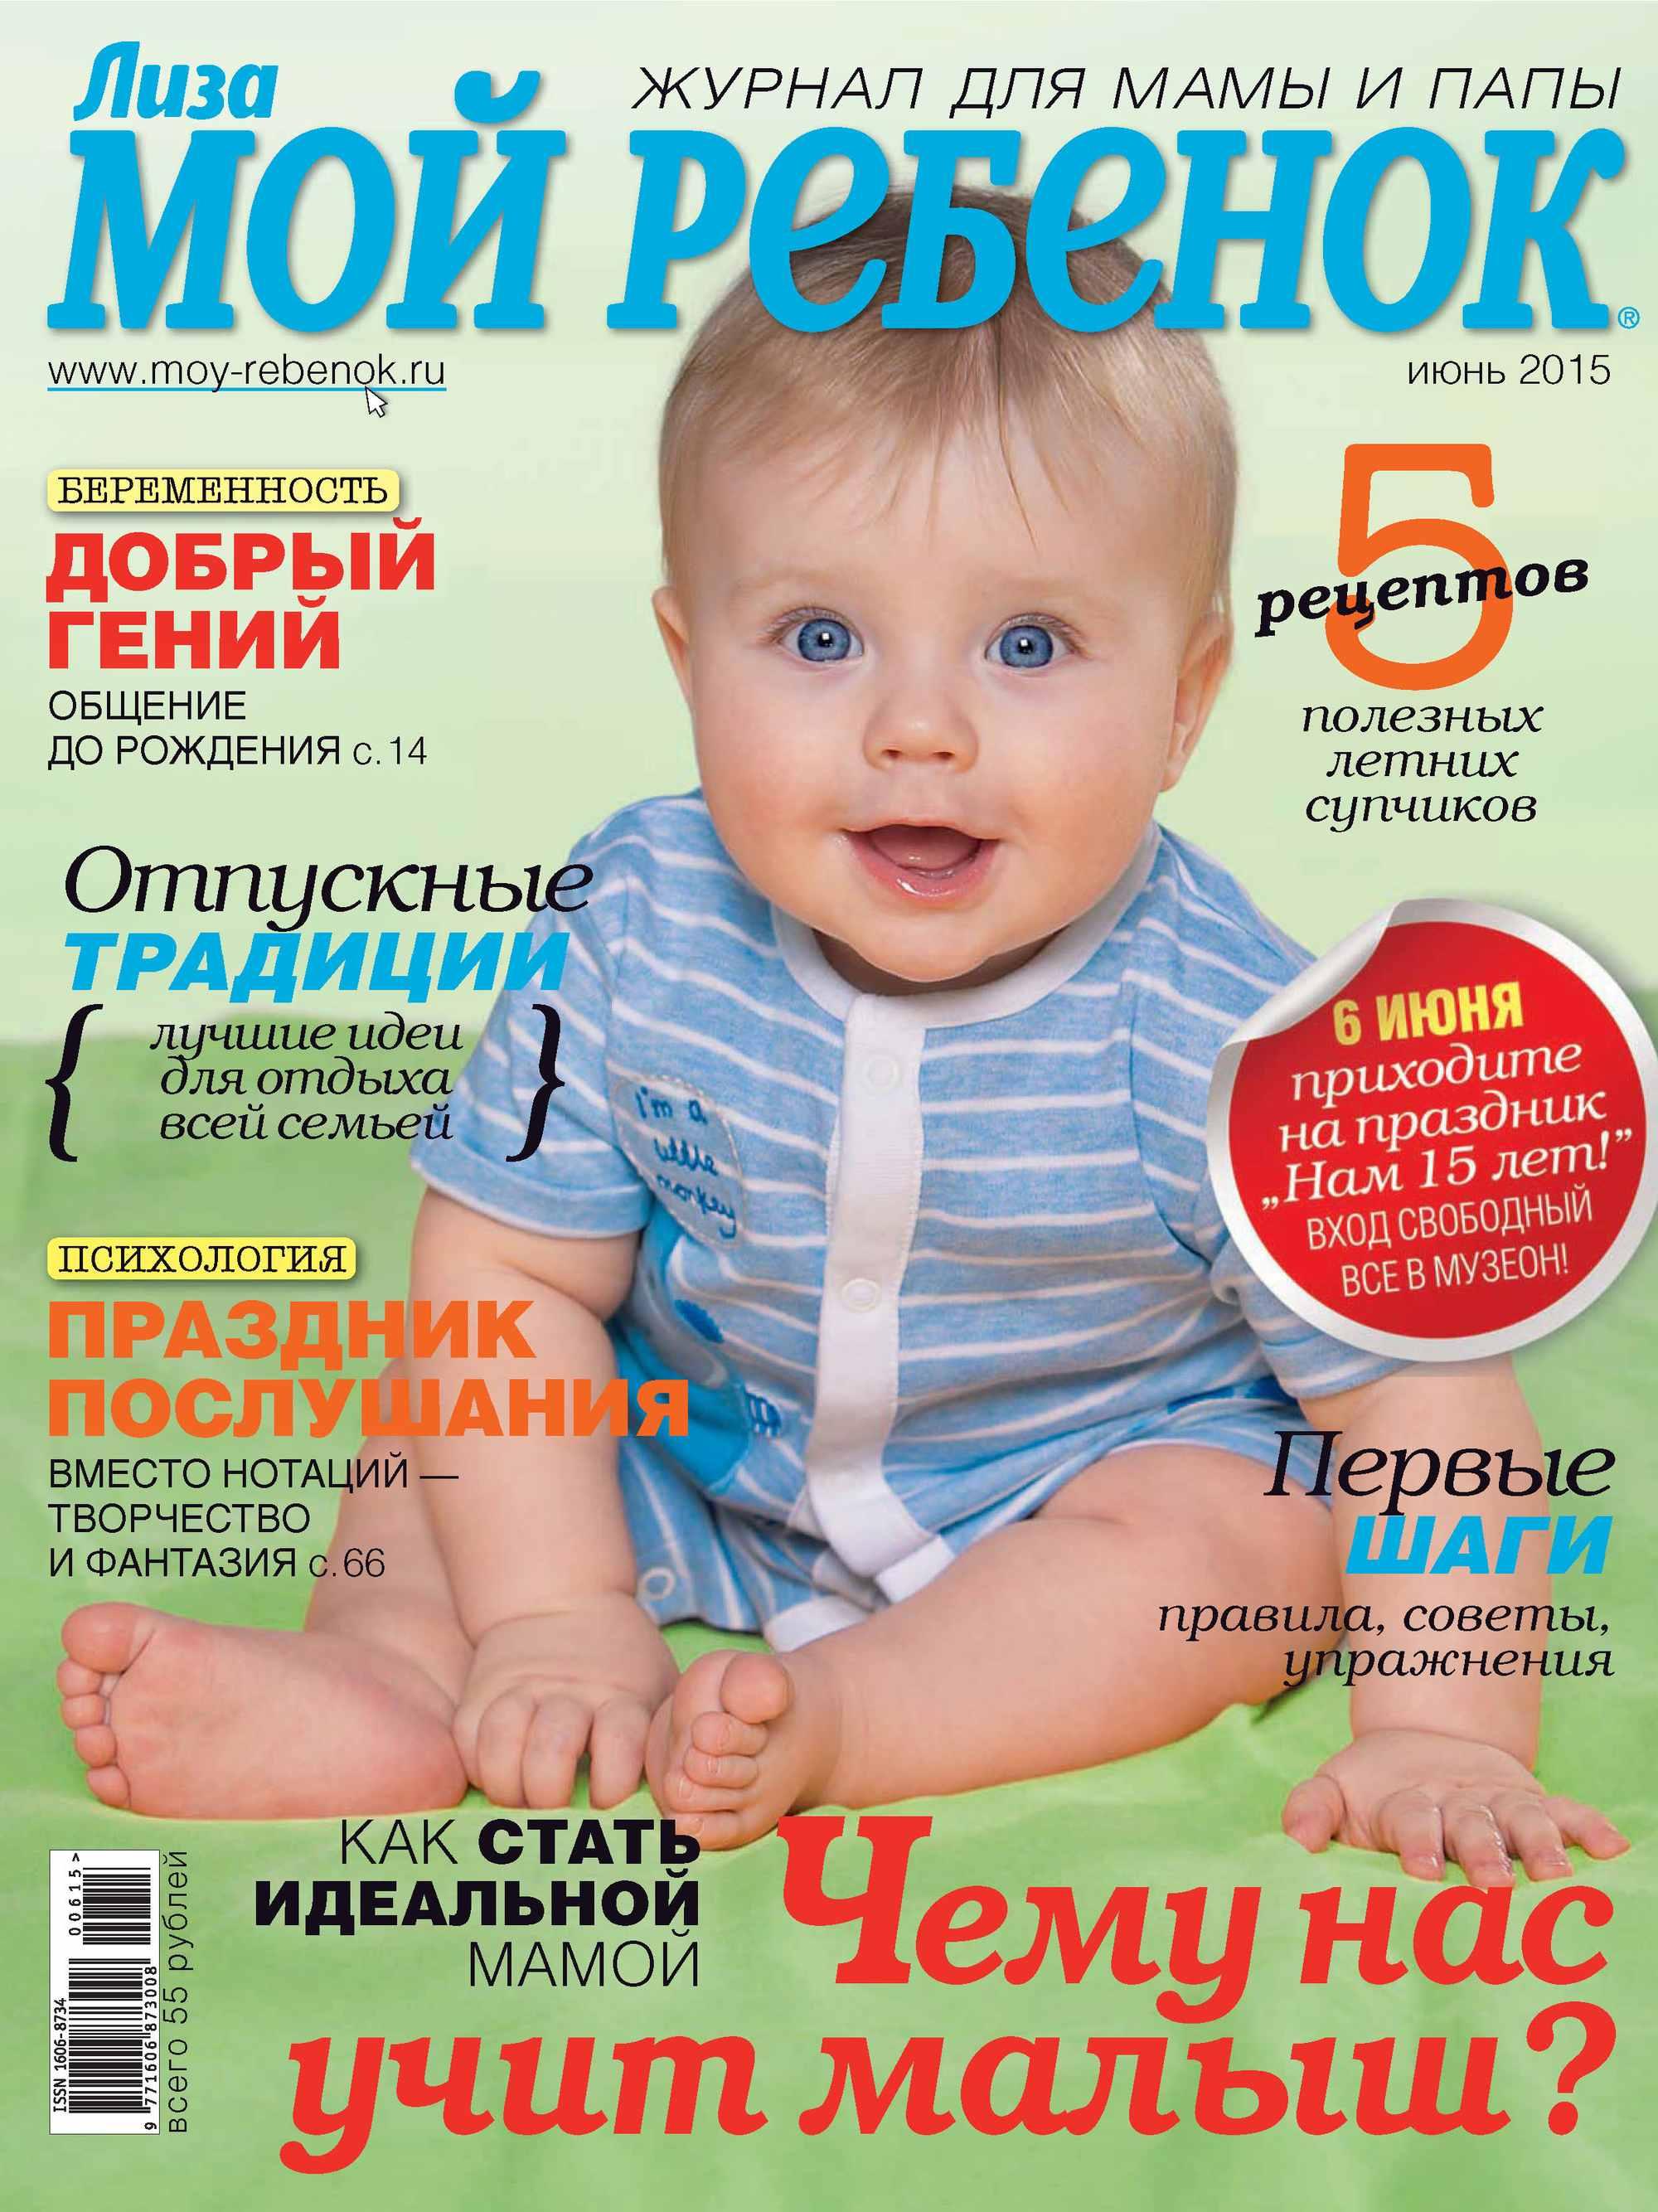 ИД «Бурда» Журнал «Лиза. Мой ребенок» №06/2015 ид бурда журнал лиза мой ребенок 03 2014